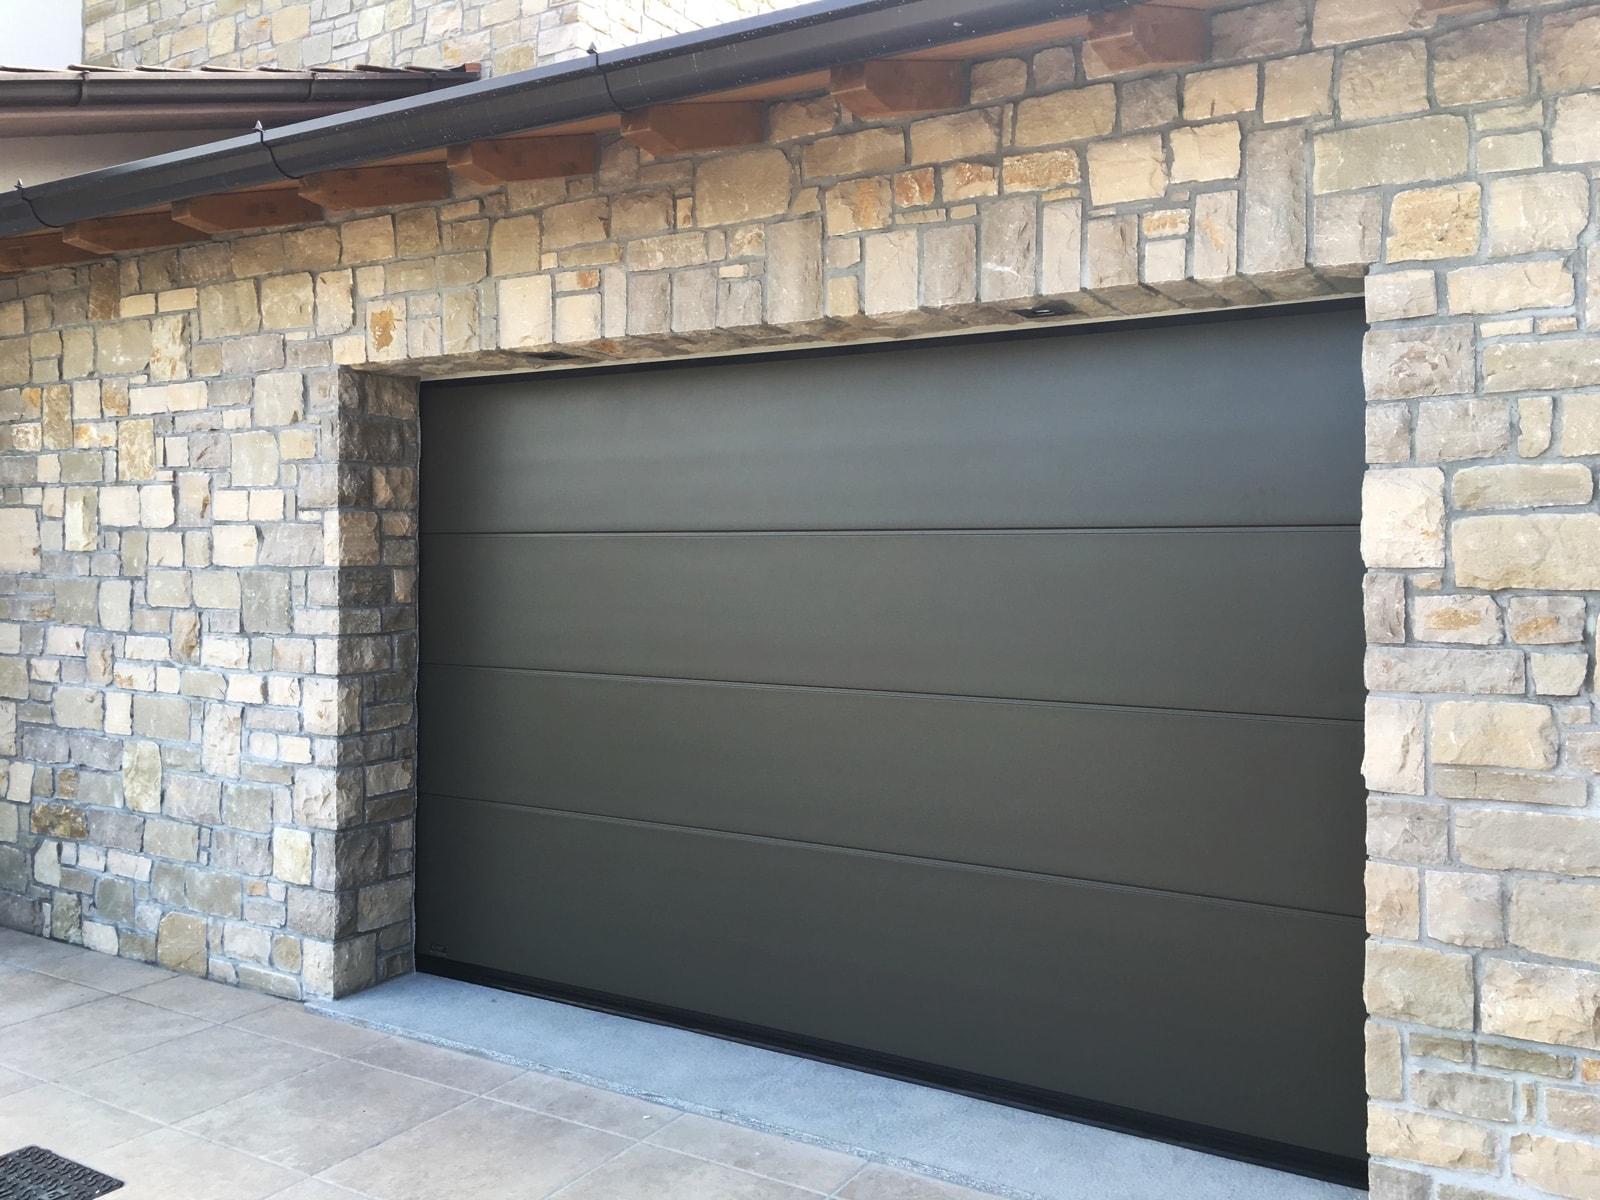 Portone sezionale da garage PERSUS - Liscio grigio RAL 7013